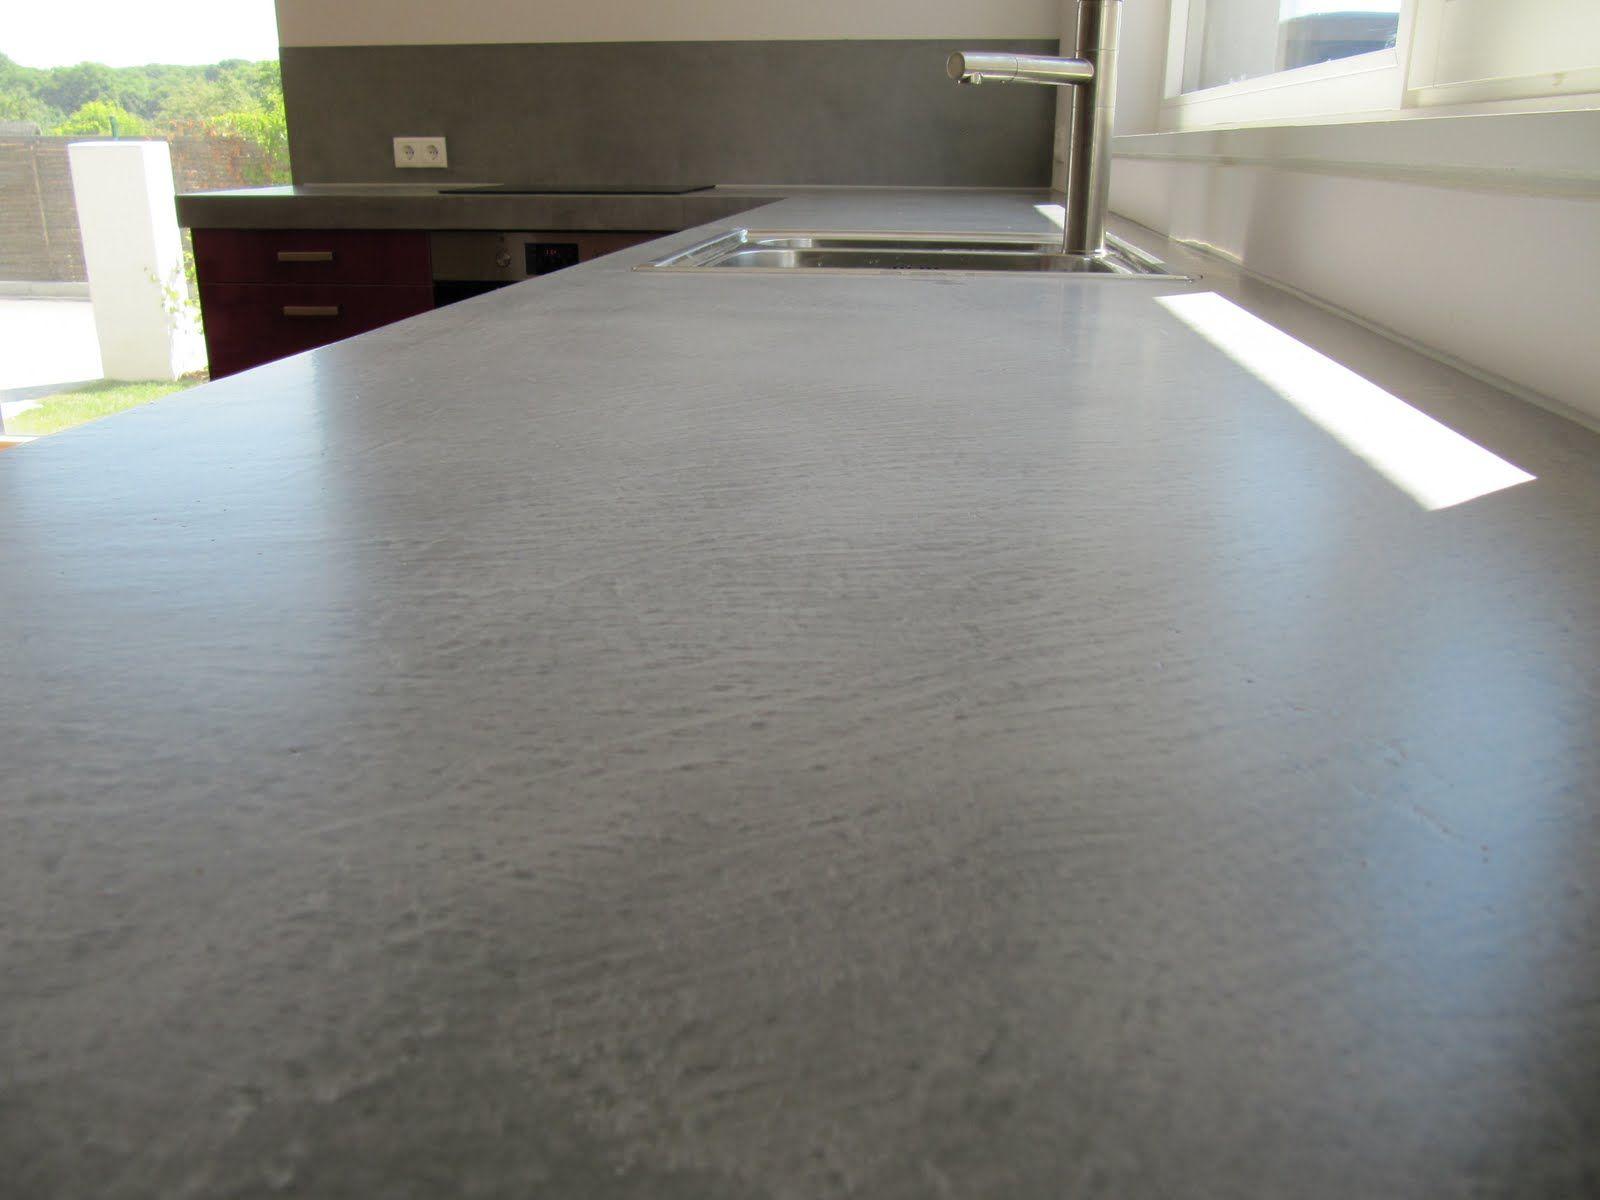 Küche Betonarbeitsplatte beton unique beton cire beton cire küche betonarbeitsplatte